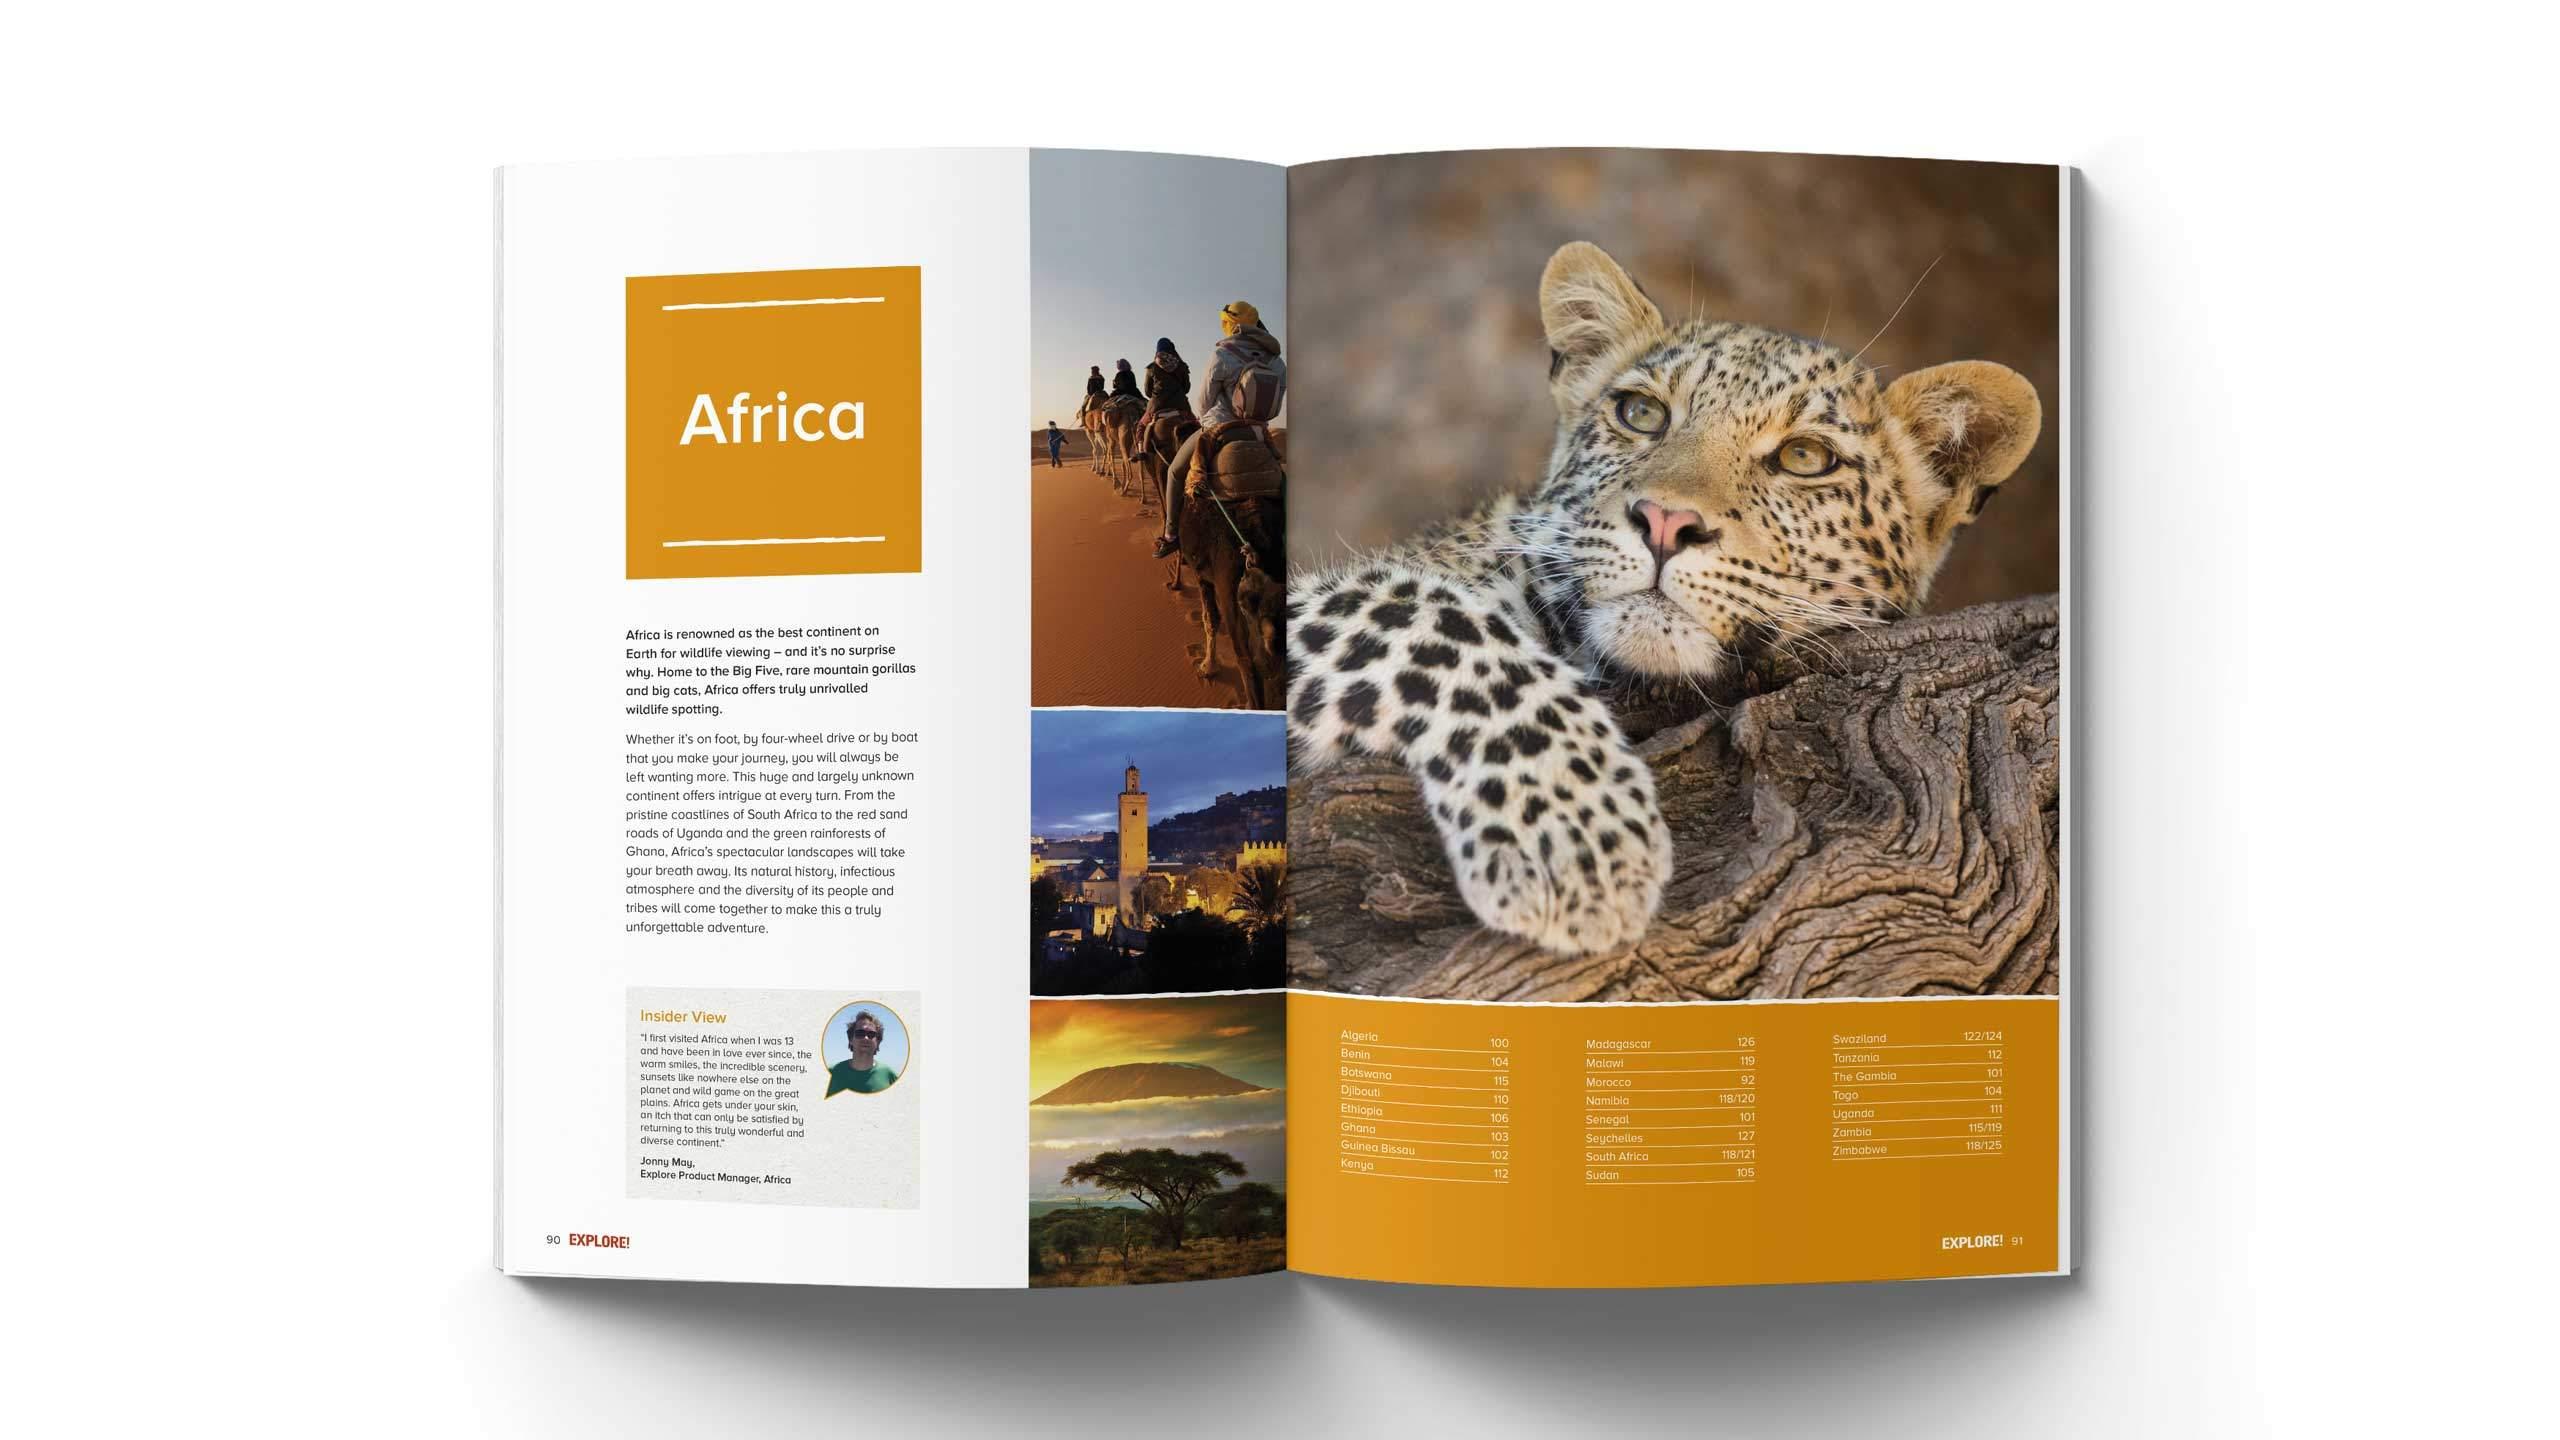 adventure travel branding refresh africa intro pages explore worldwide